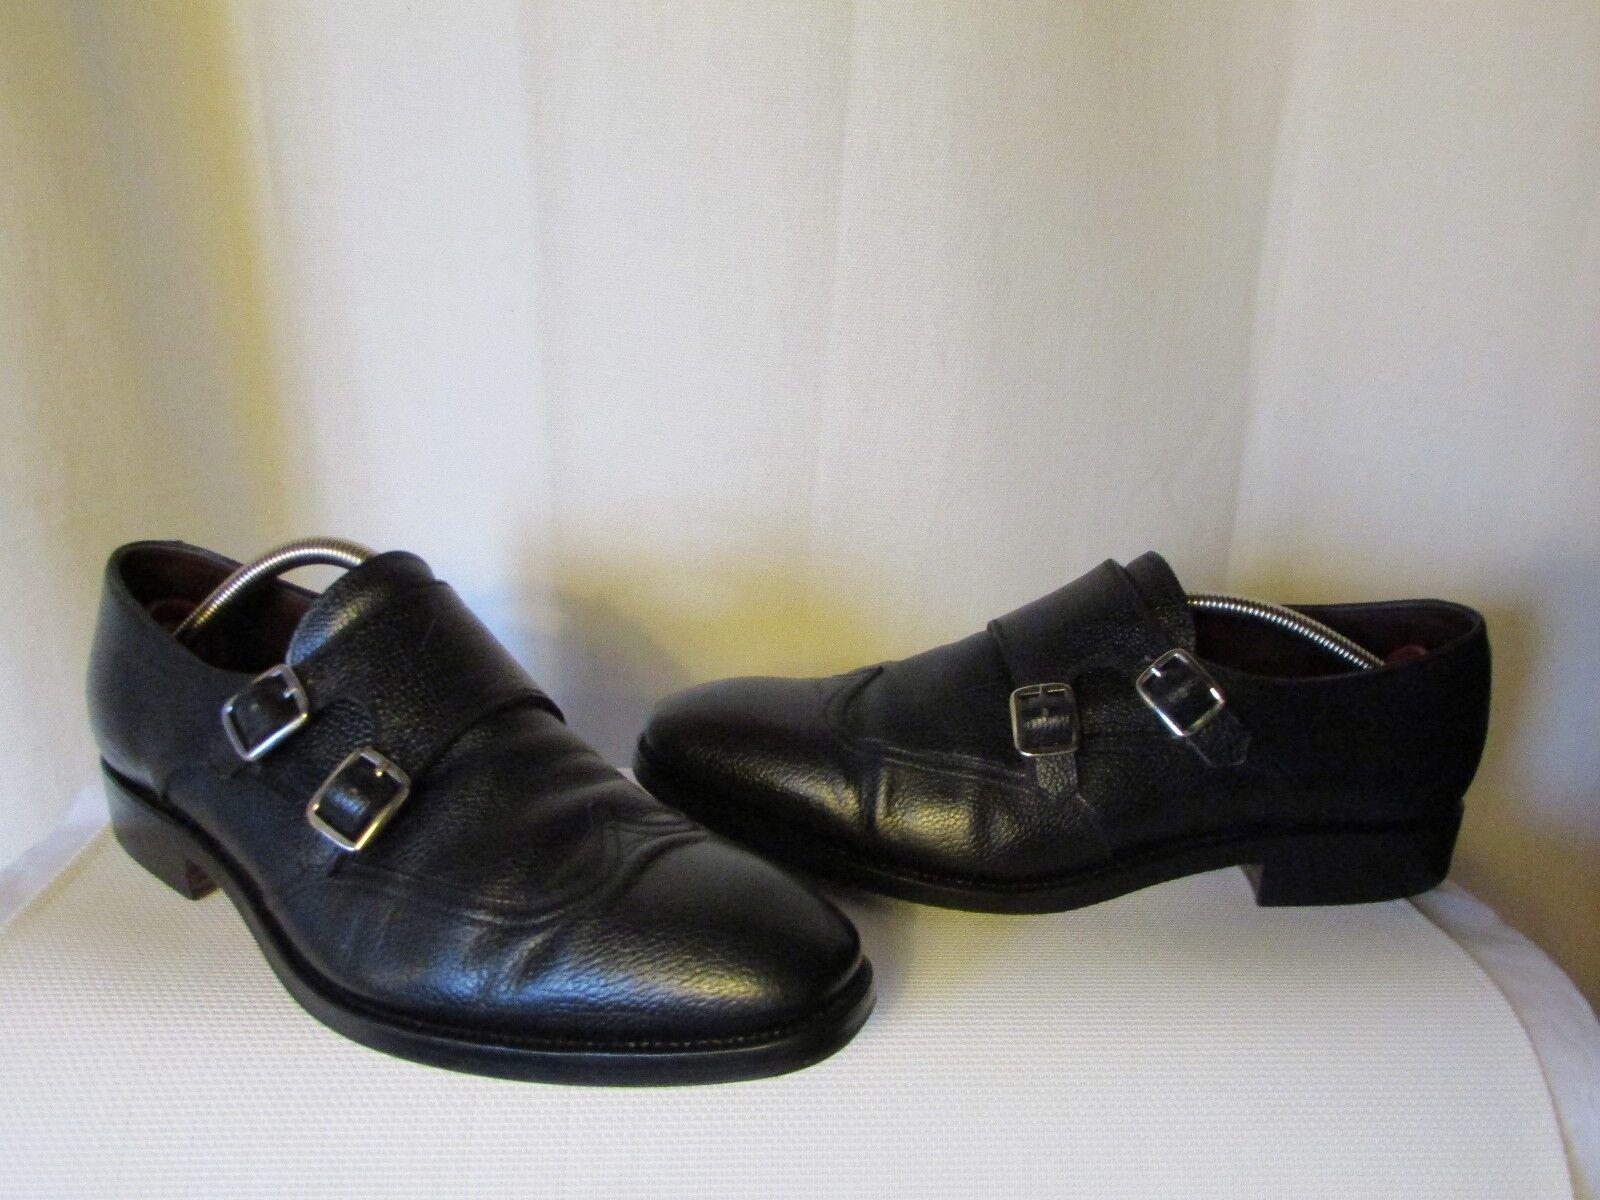 shoes Carmina by José Albalagejo Pujadas Leather Granulated Black Size 8